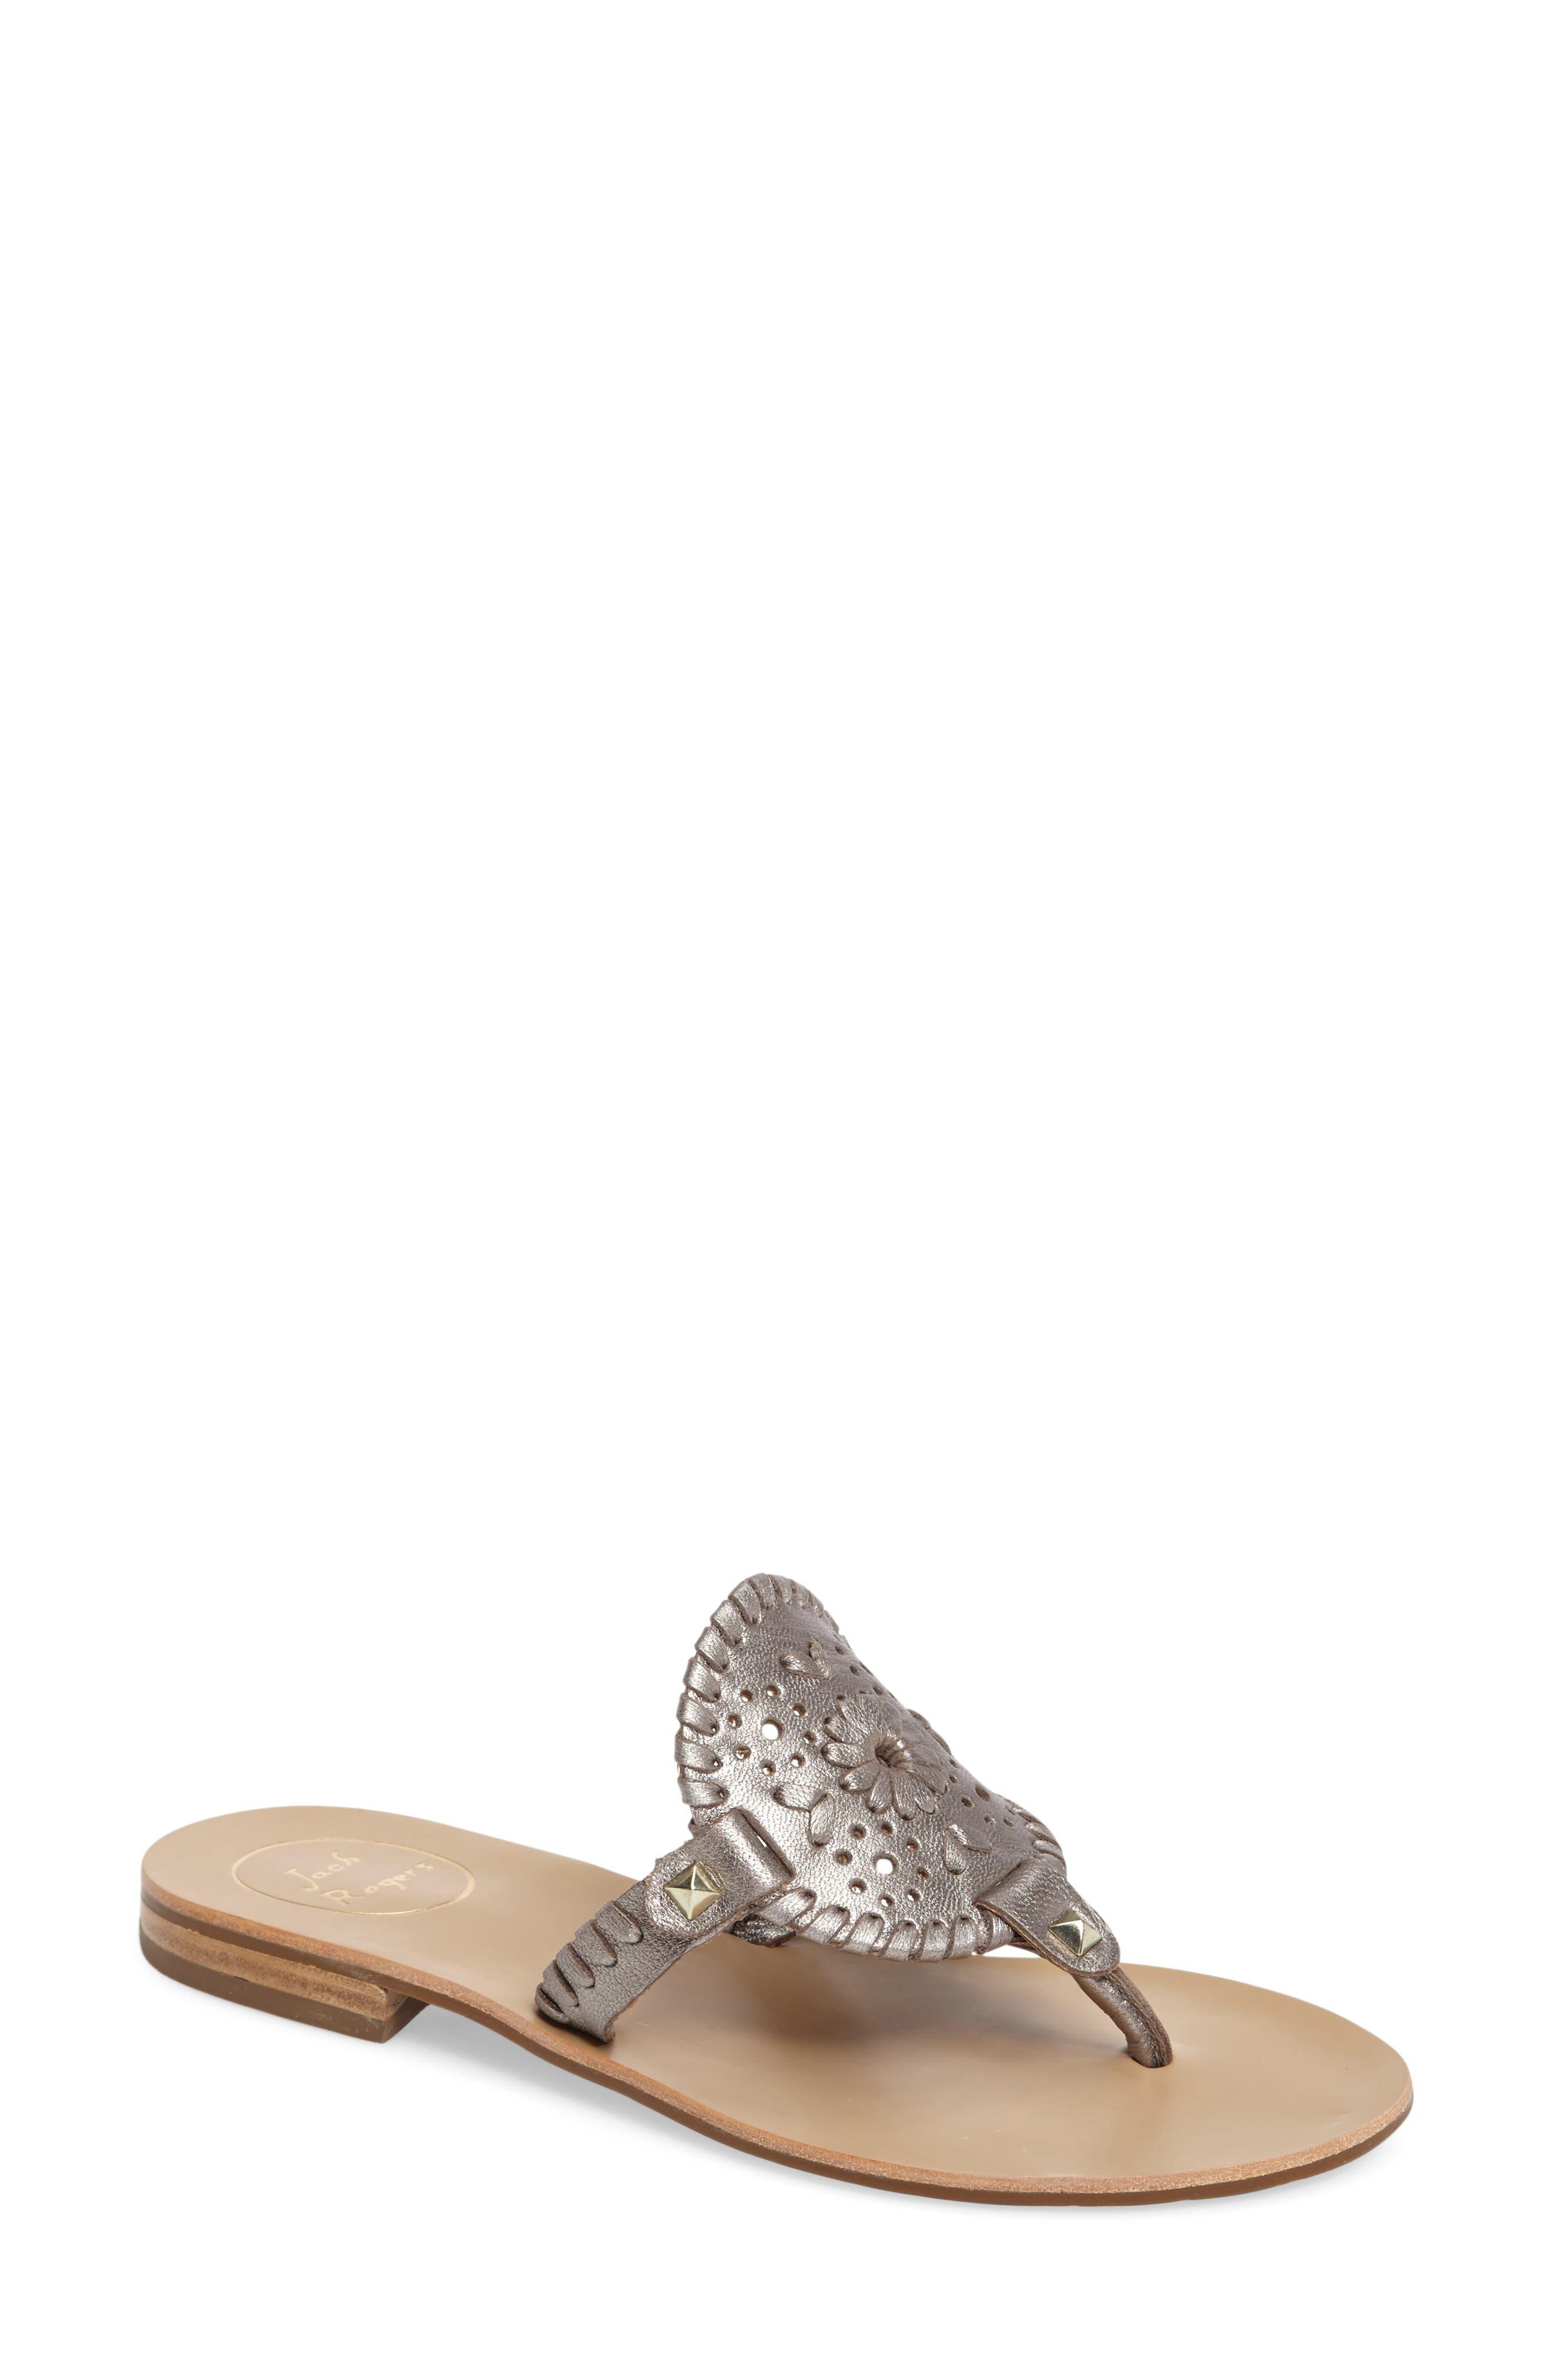 Jack Rogers 'Georgica' Sandals (Women)